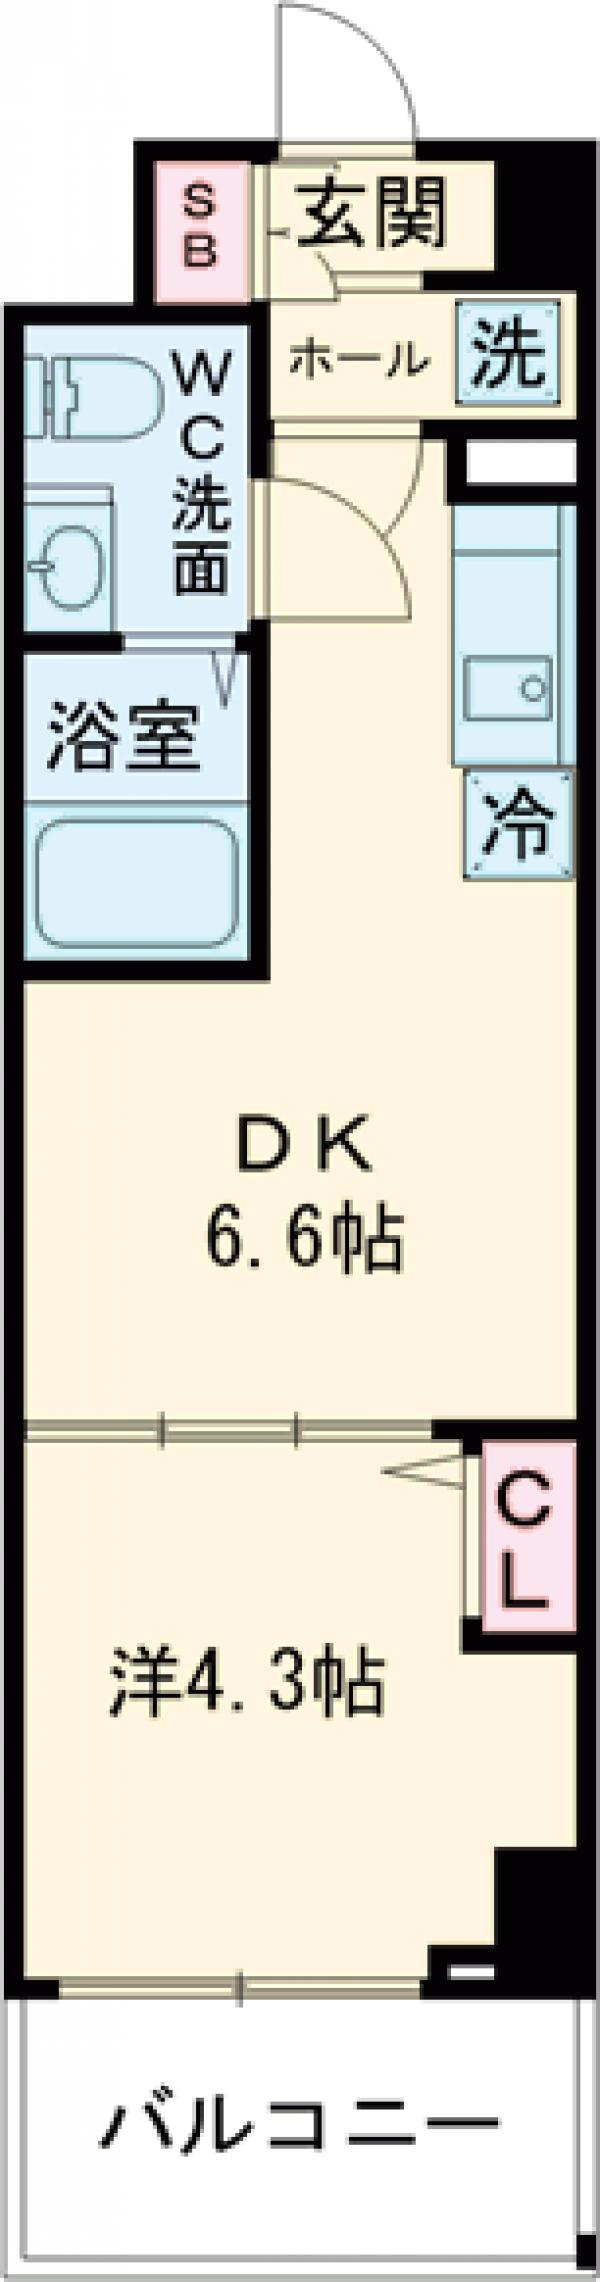 KDXレジデンス梅島・708号室の間取り